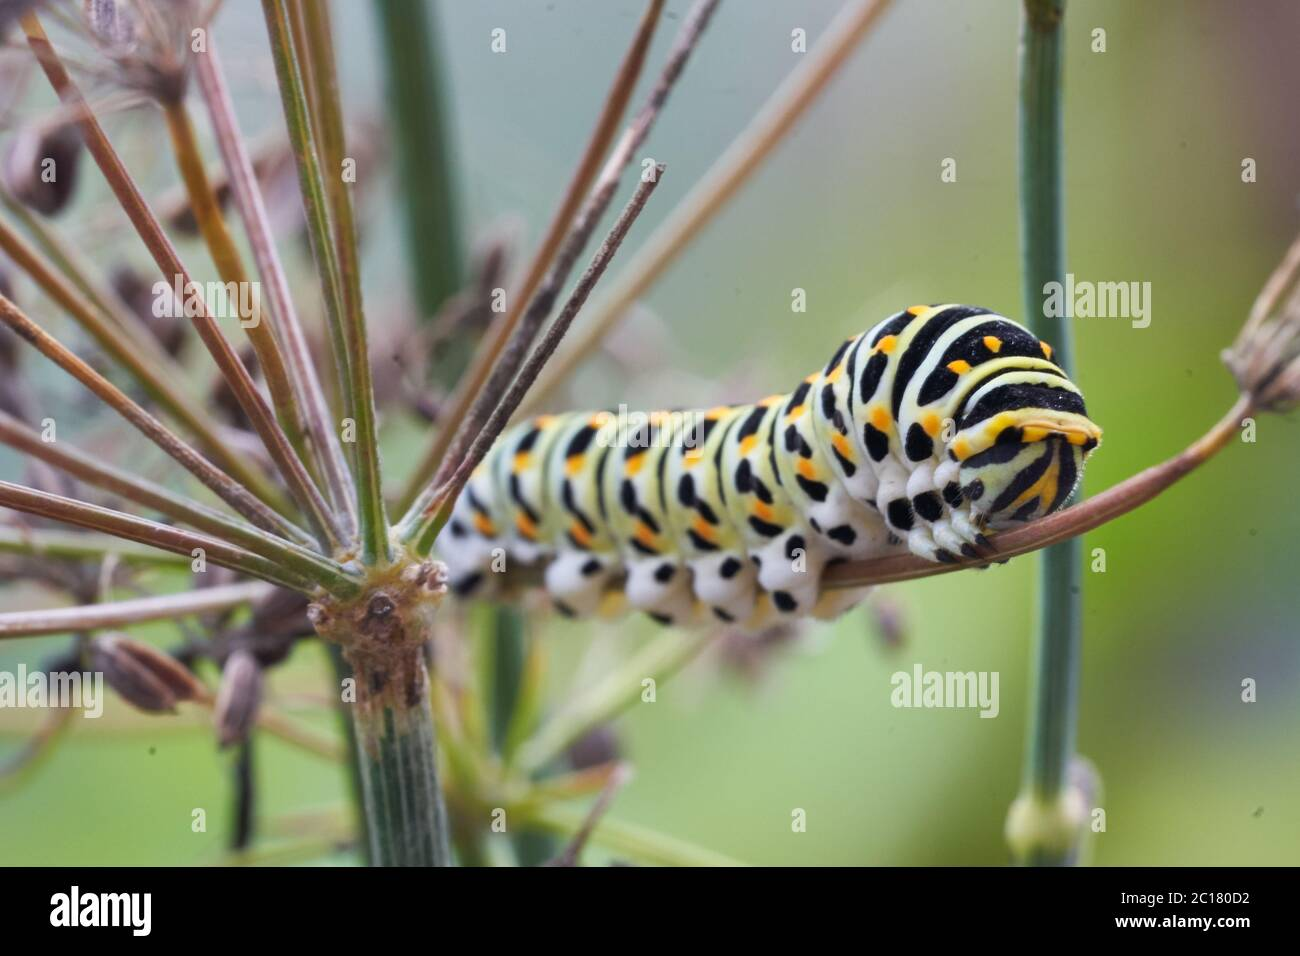 Papilio machaon Old World swallowtail butterfly Papilionidae yellow Caterpillar Portrait Macro Stock Photo